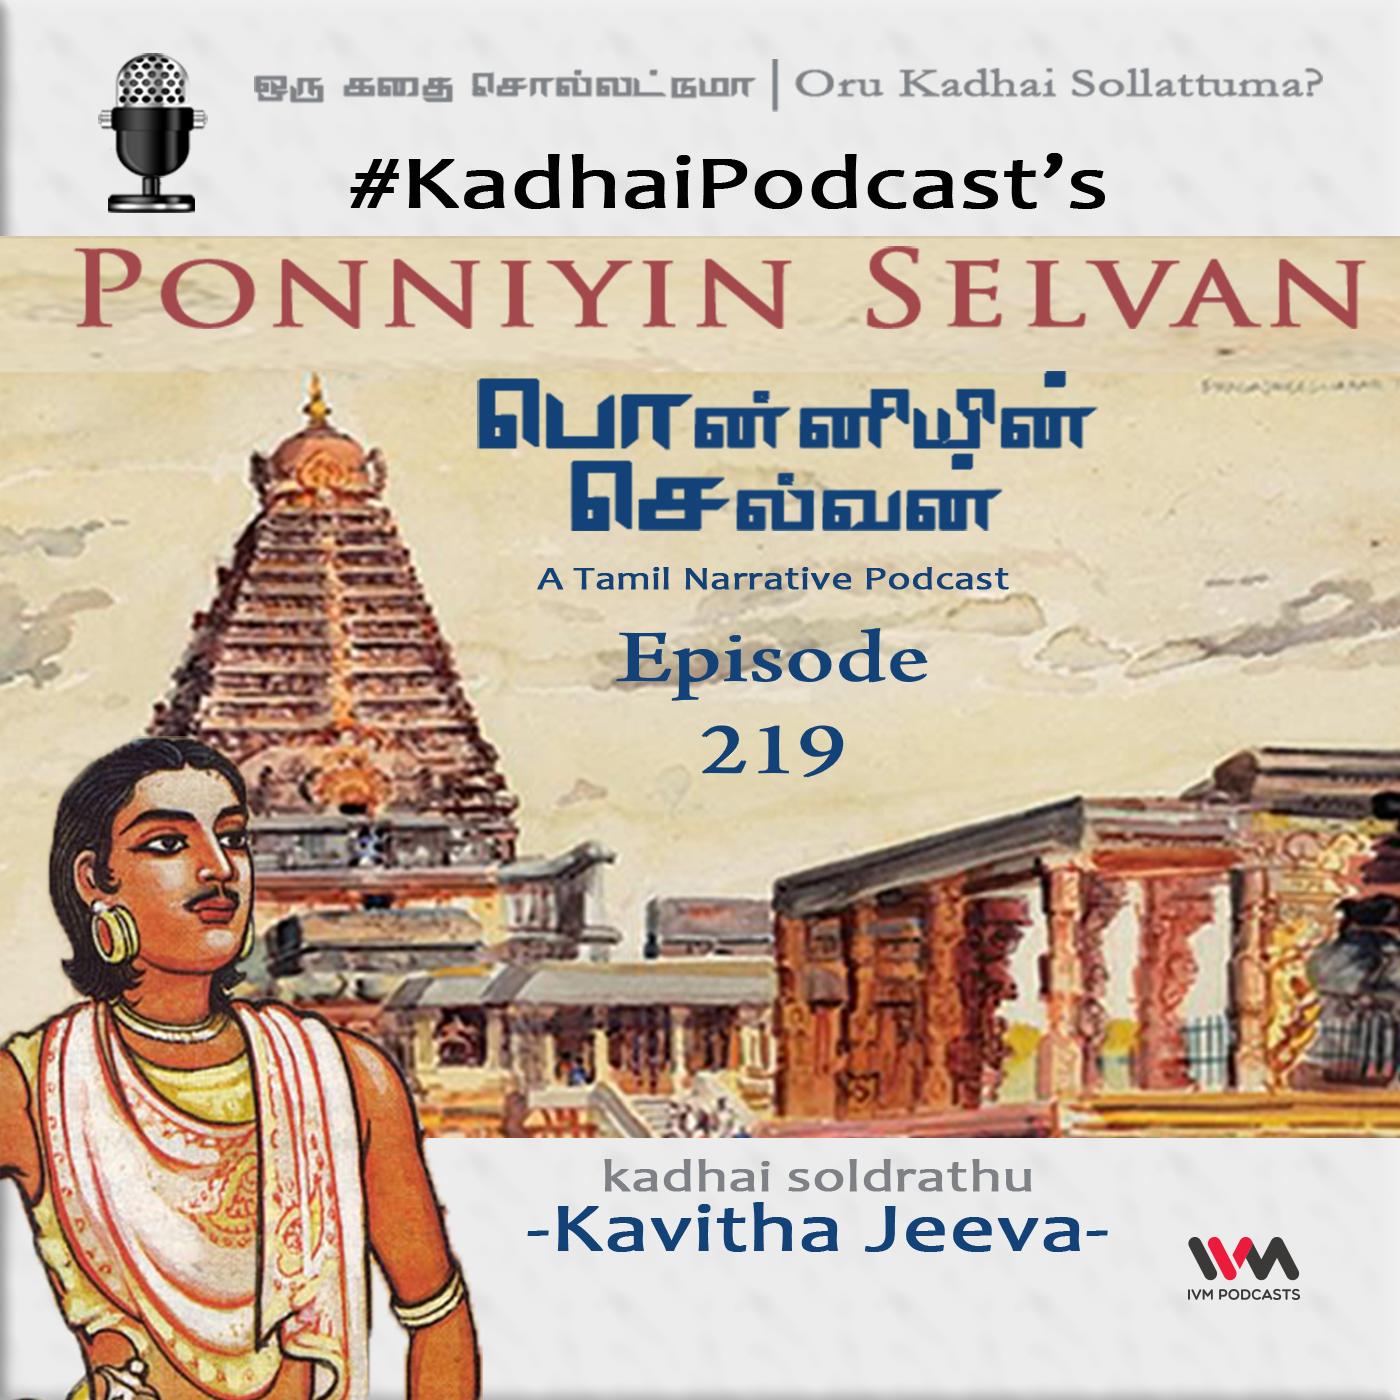 KadhaiPodcast's Ponniyin Selvan - Episode # 219